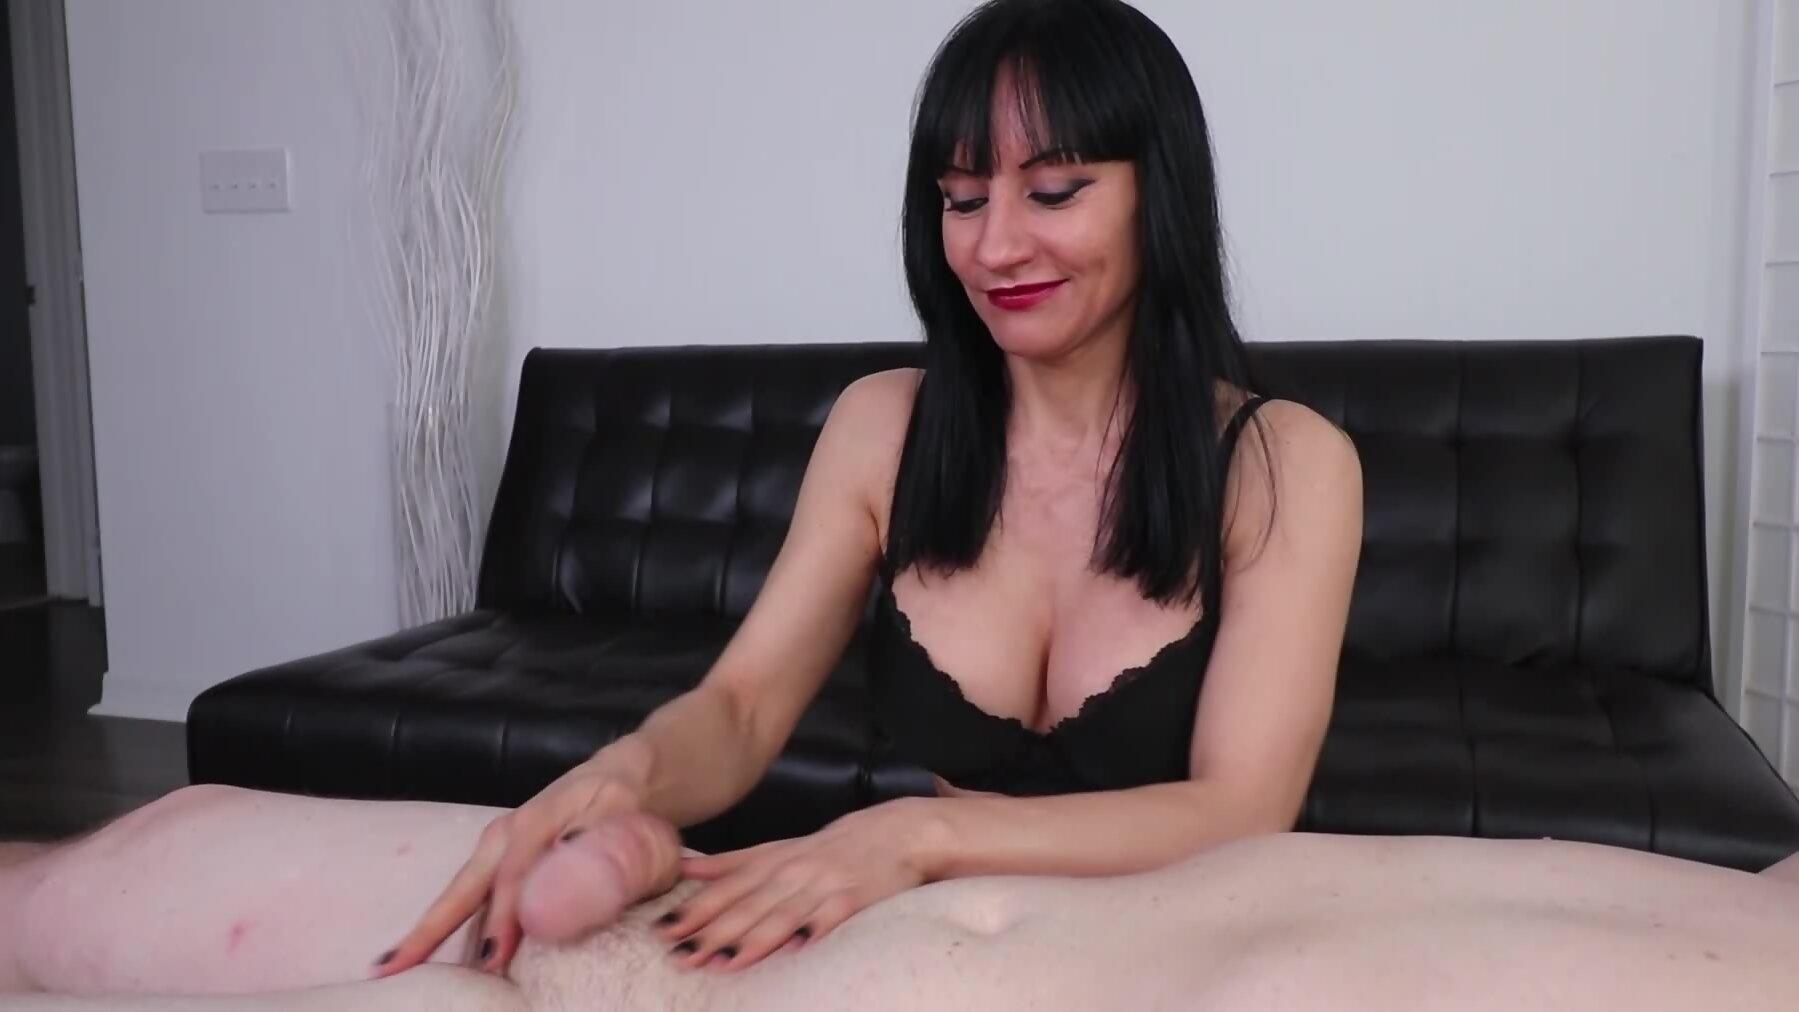 Pornstar exploits sex toy to make client cum with masturb...